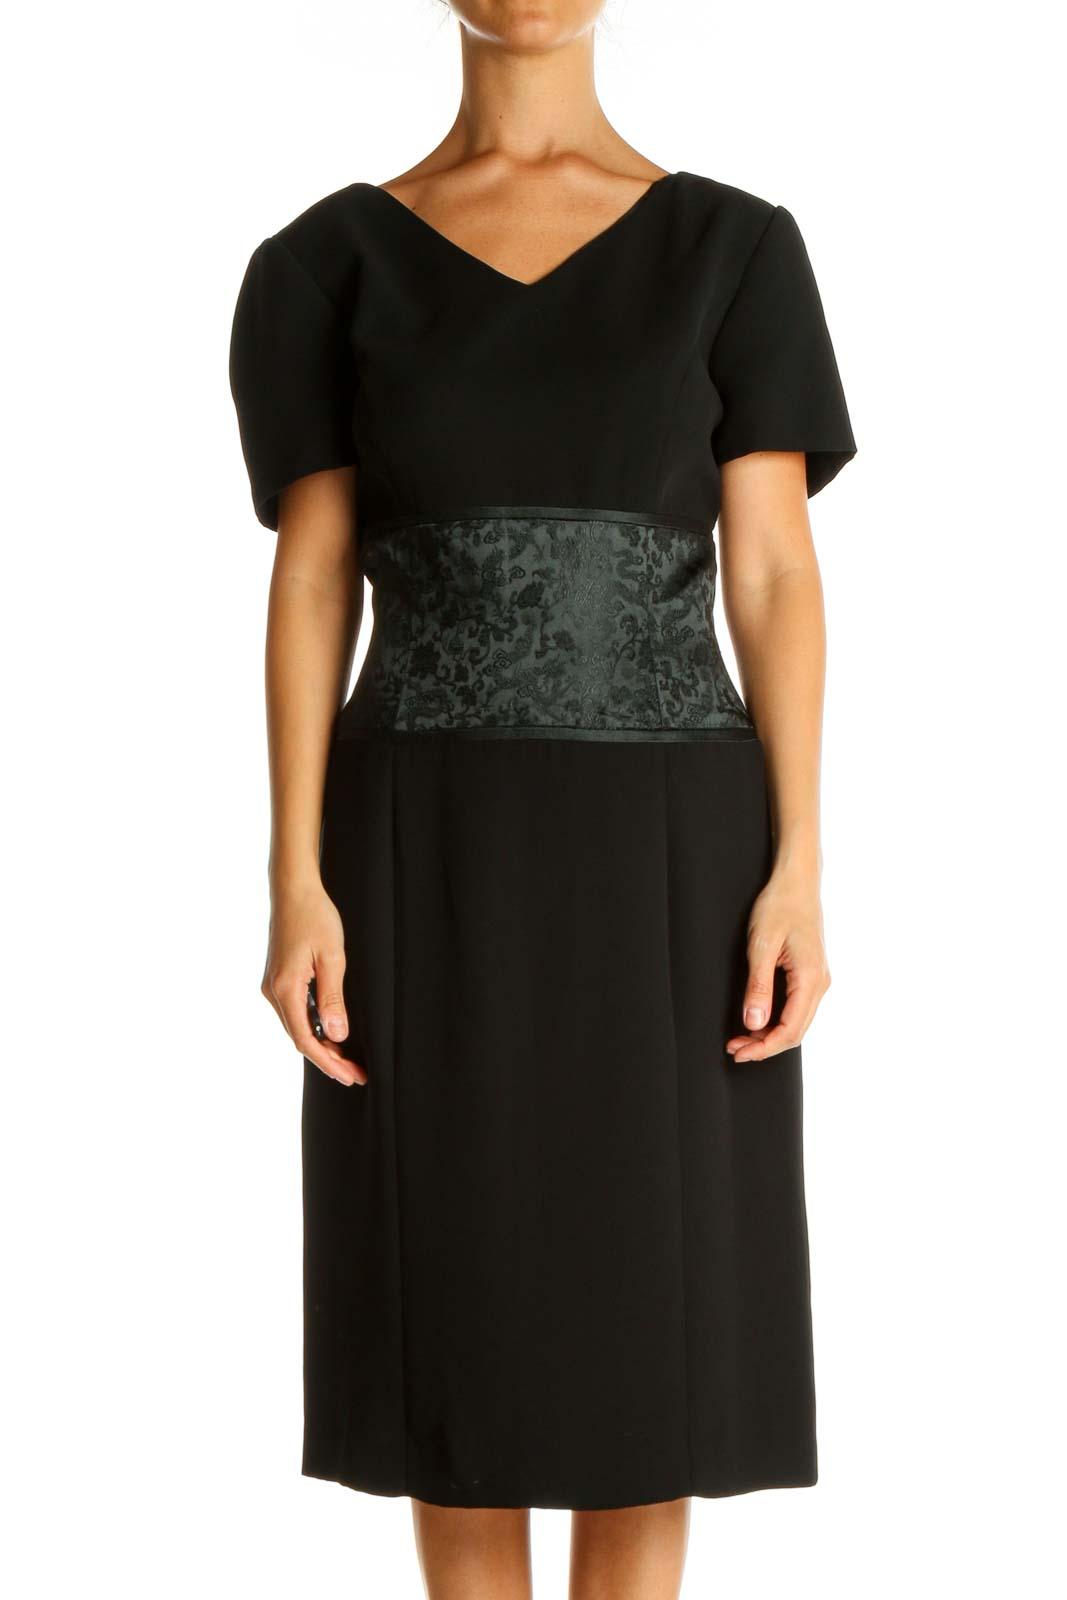 Black Solid Retro Sheath Dress Front